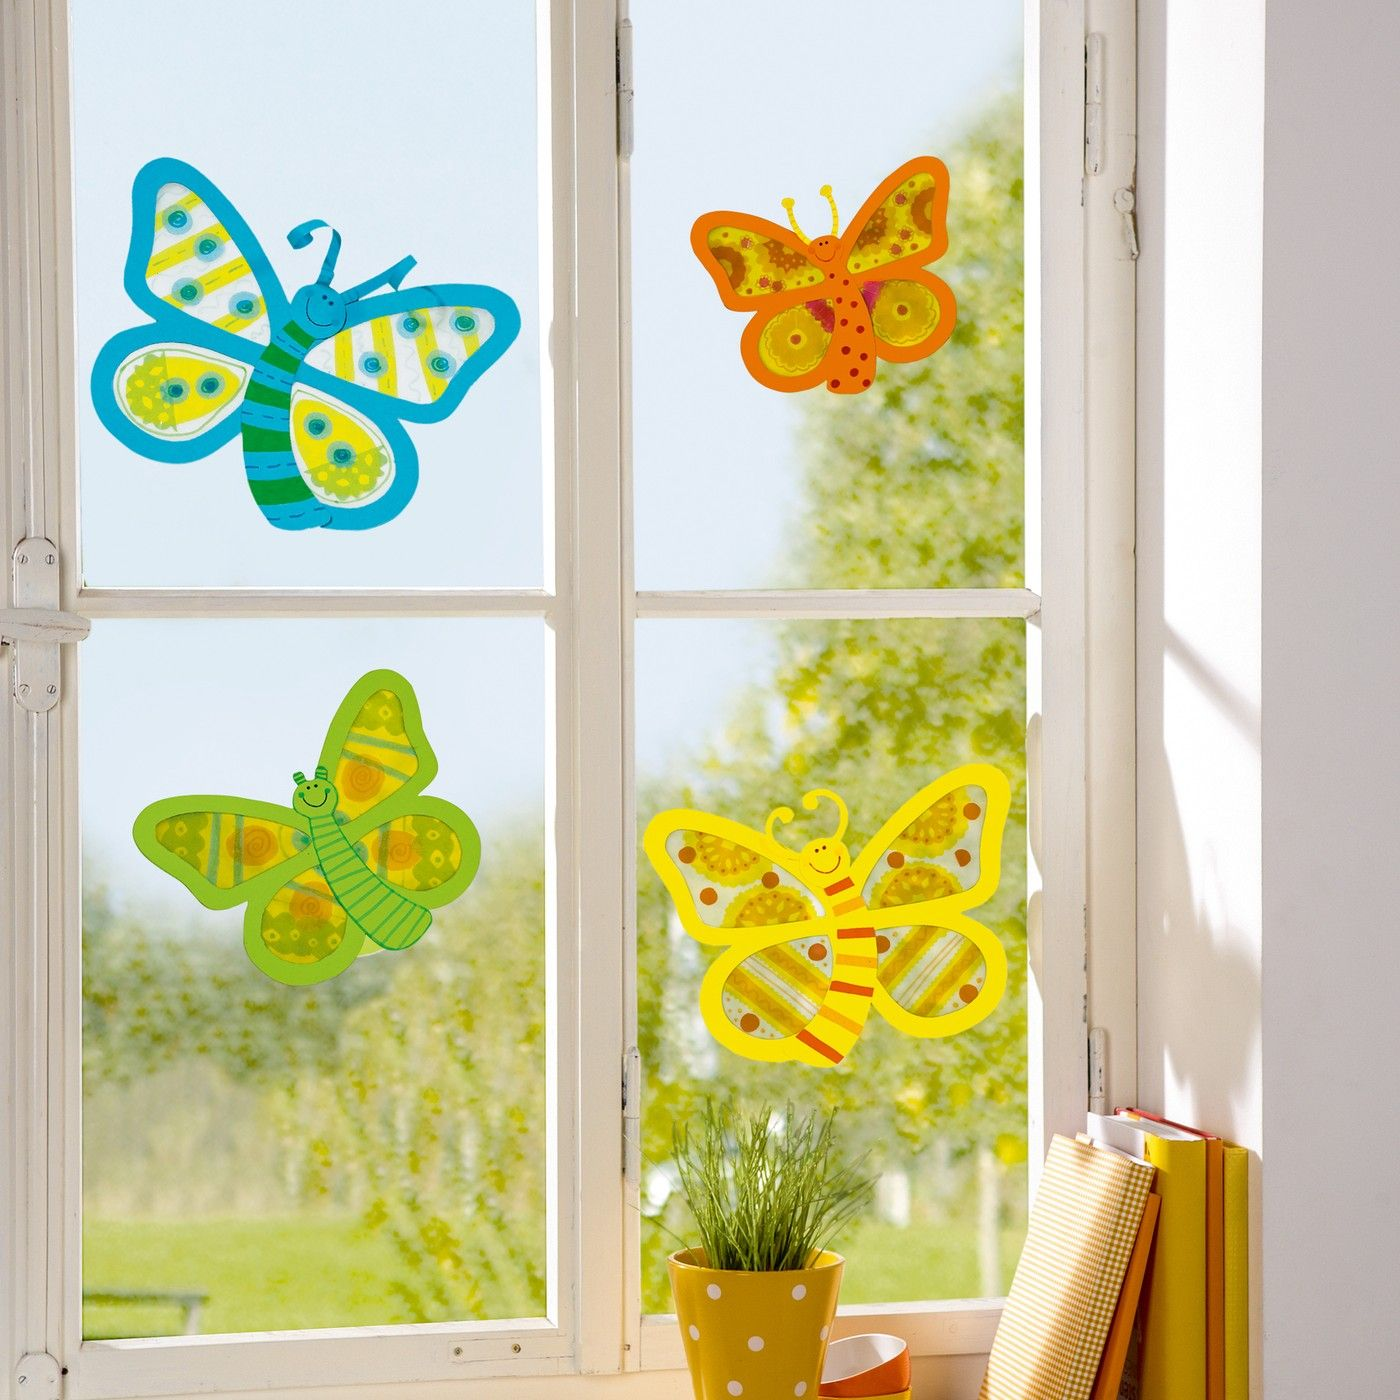 Fensterbilder schmetterlinge bastelset f r 8 st ck jako o for Fensterbilder kinderzimmer